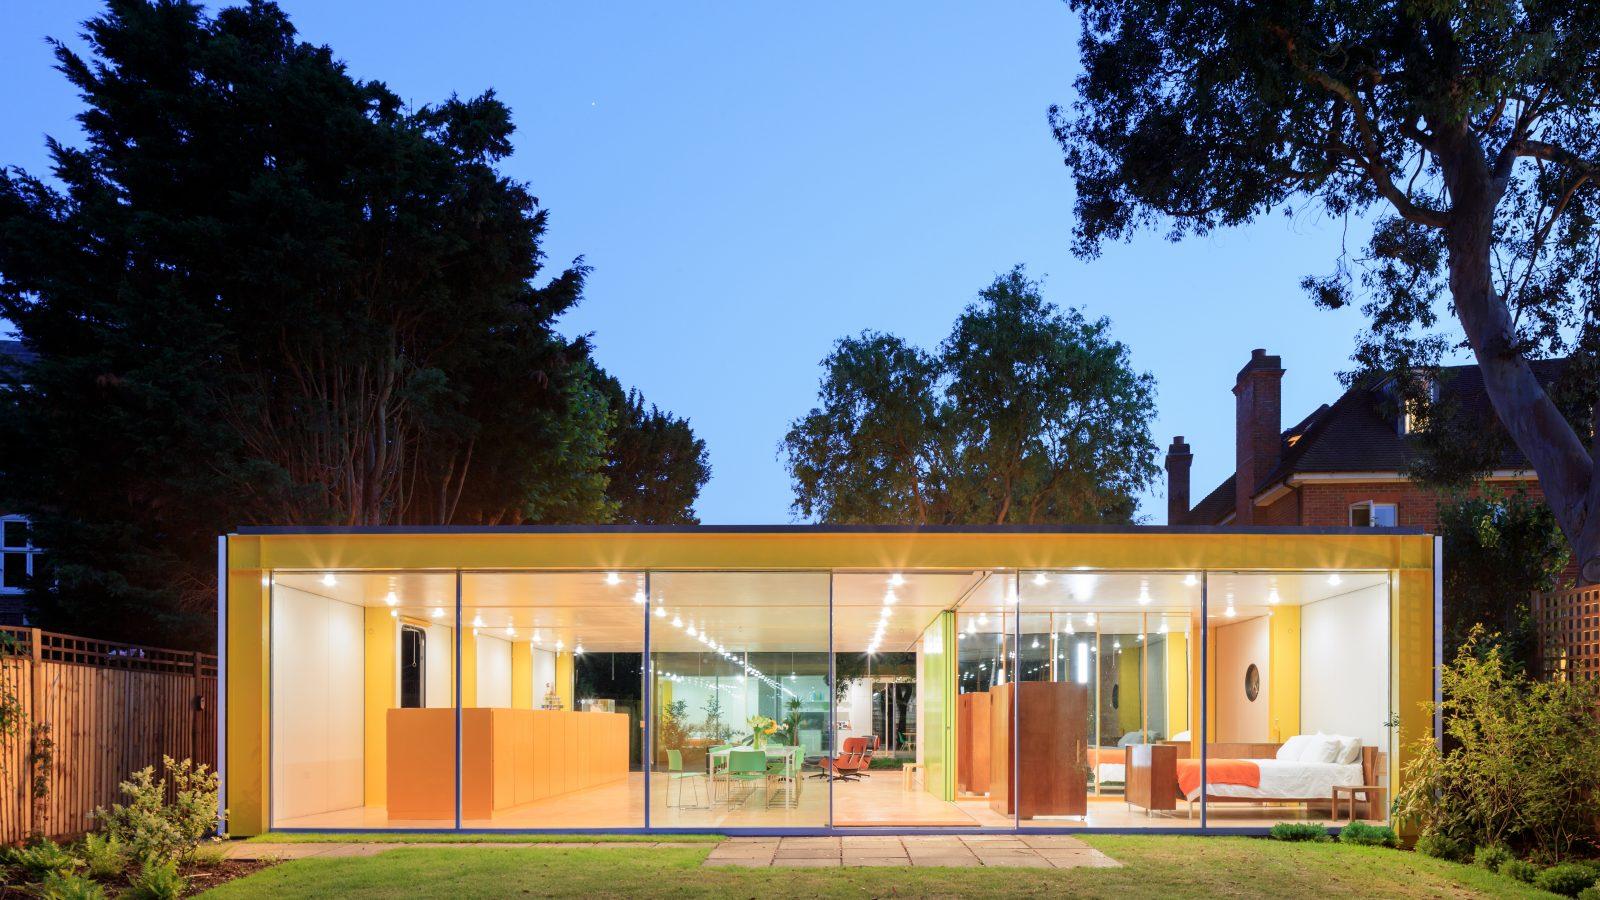 Sutton PR - Harvard Graduate School of Design - The Wimbledon House, Richard Rogers